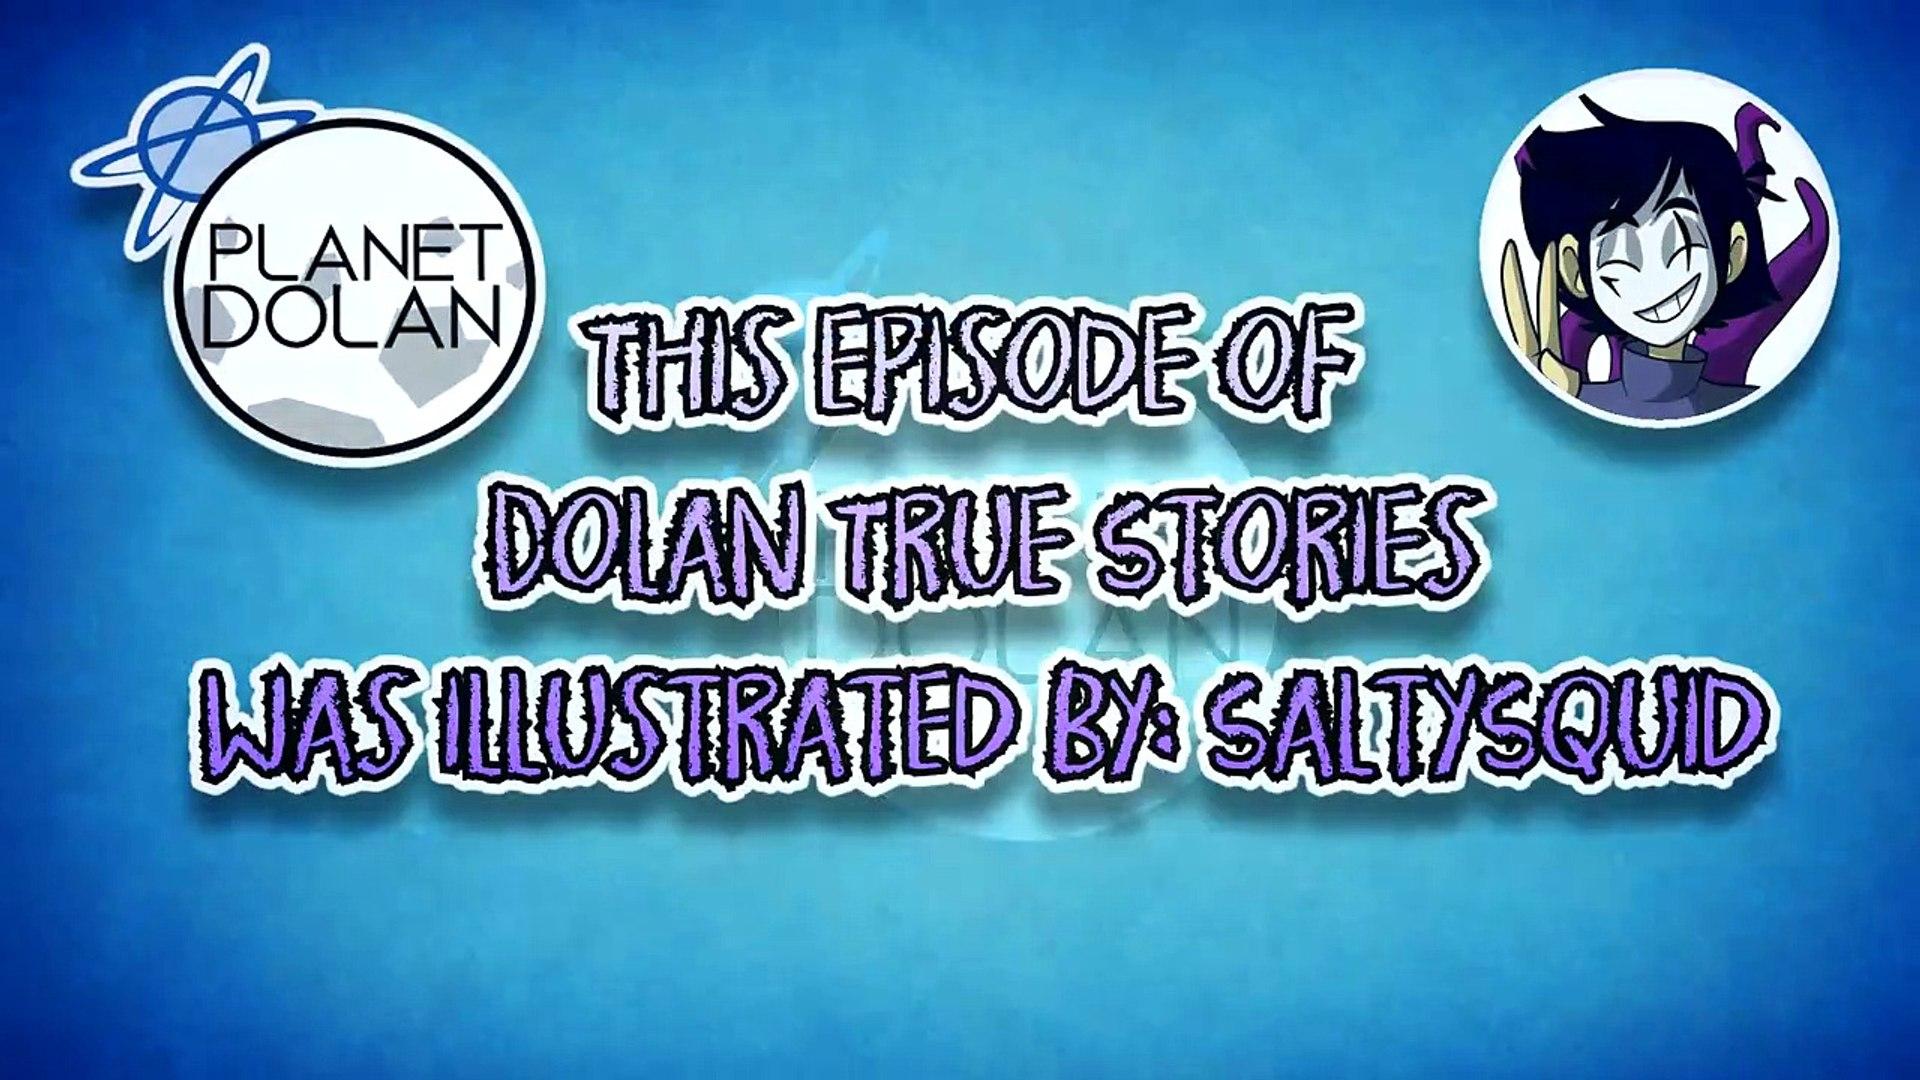 OUR WORST NIGHTMARES _ Dolan True Stories-1OJ0aZ